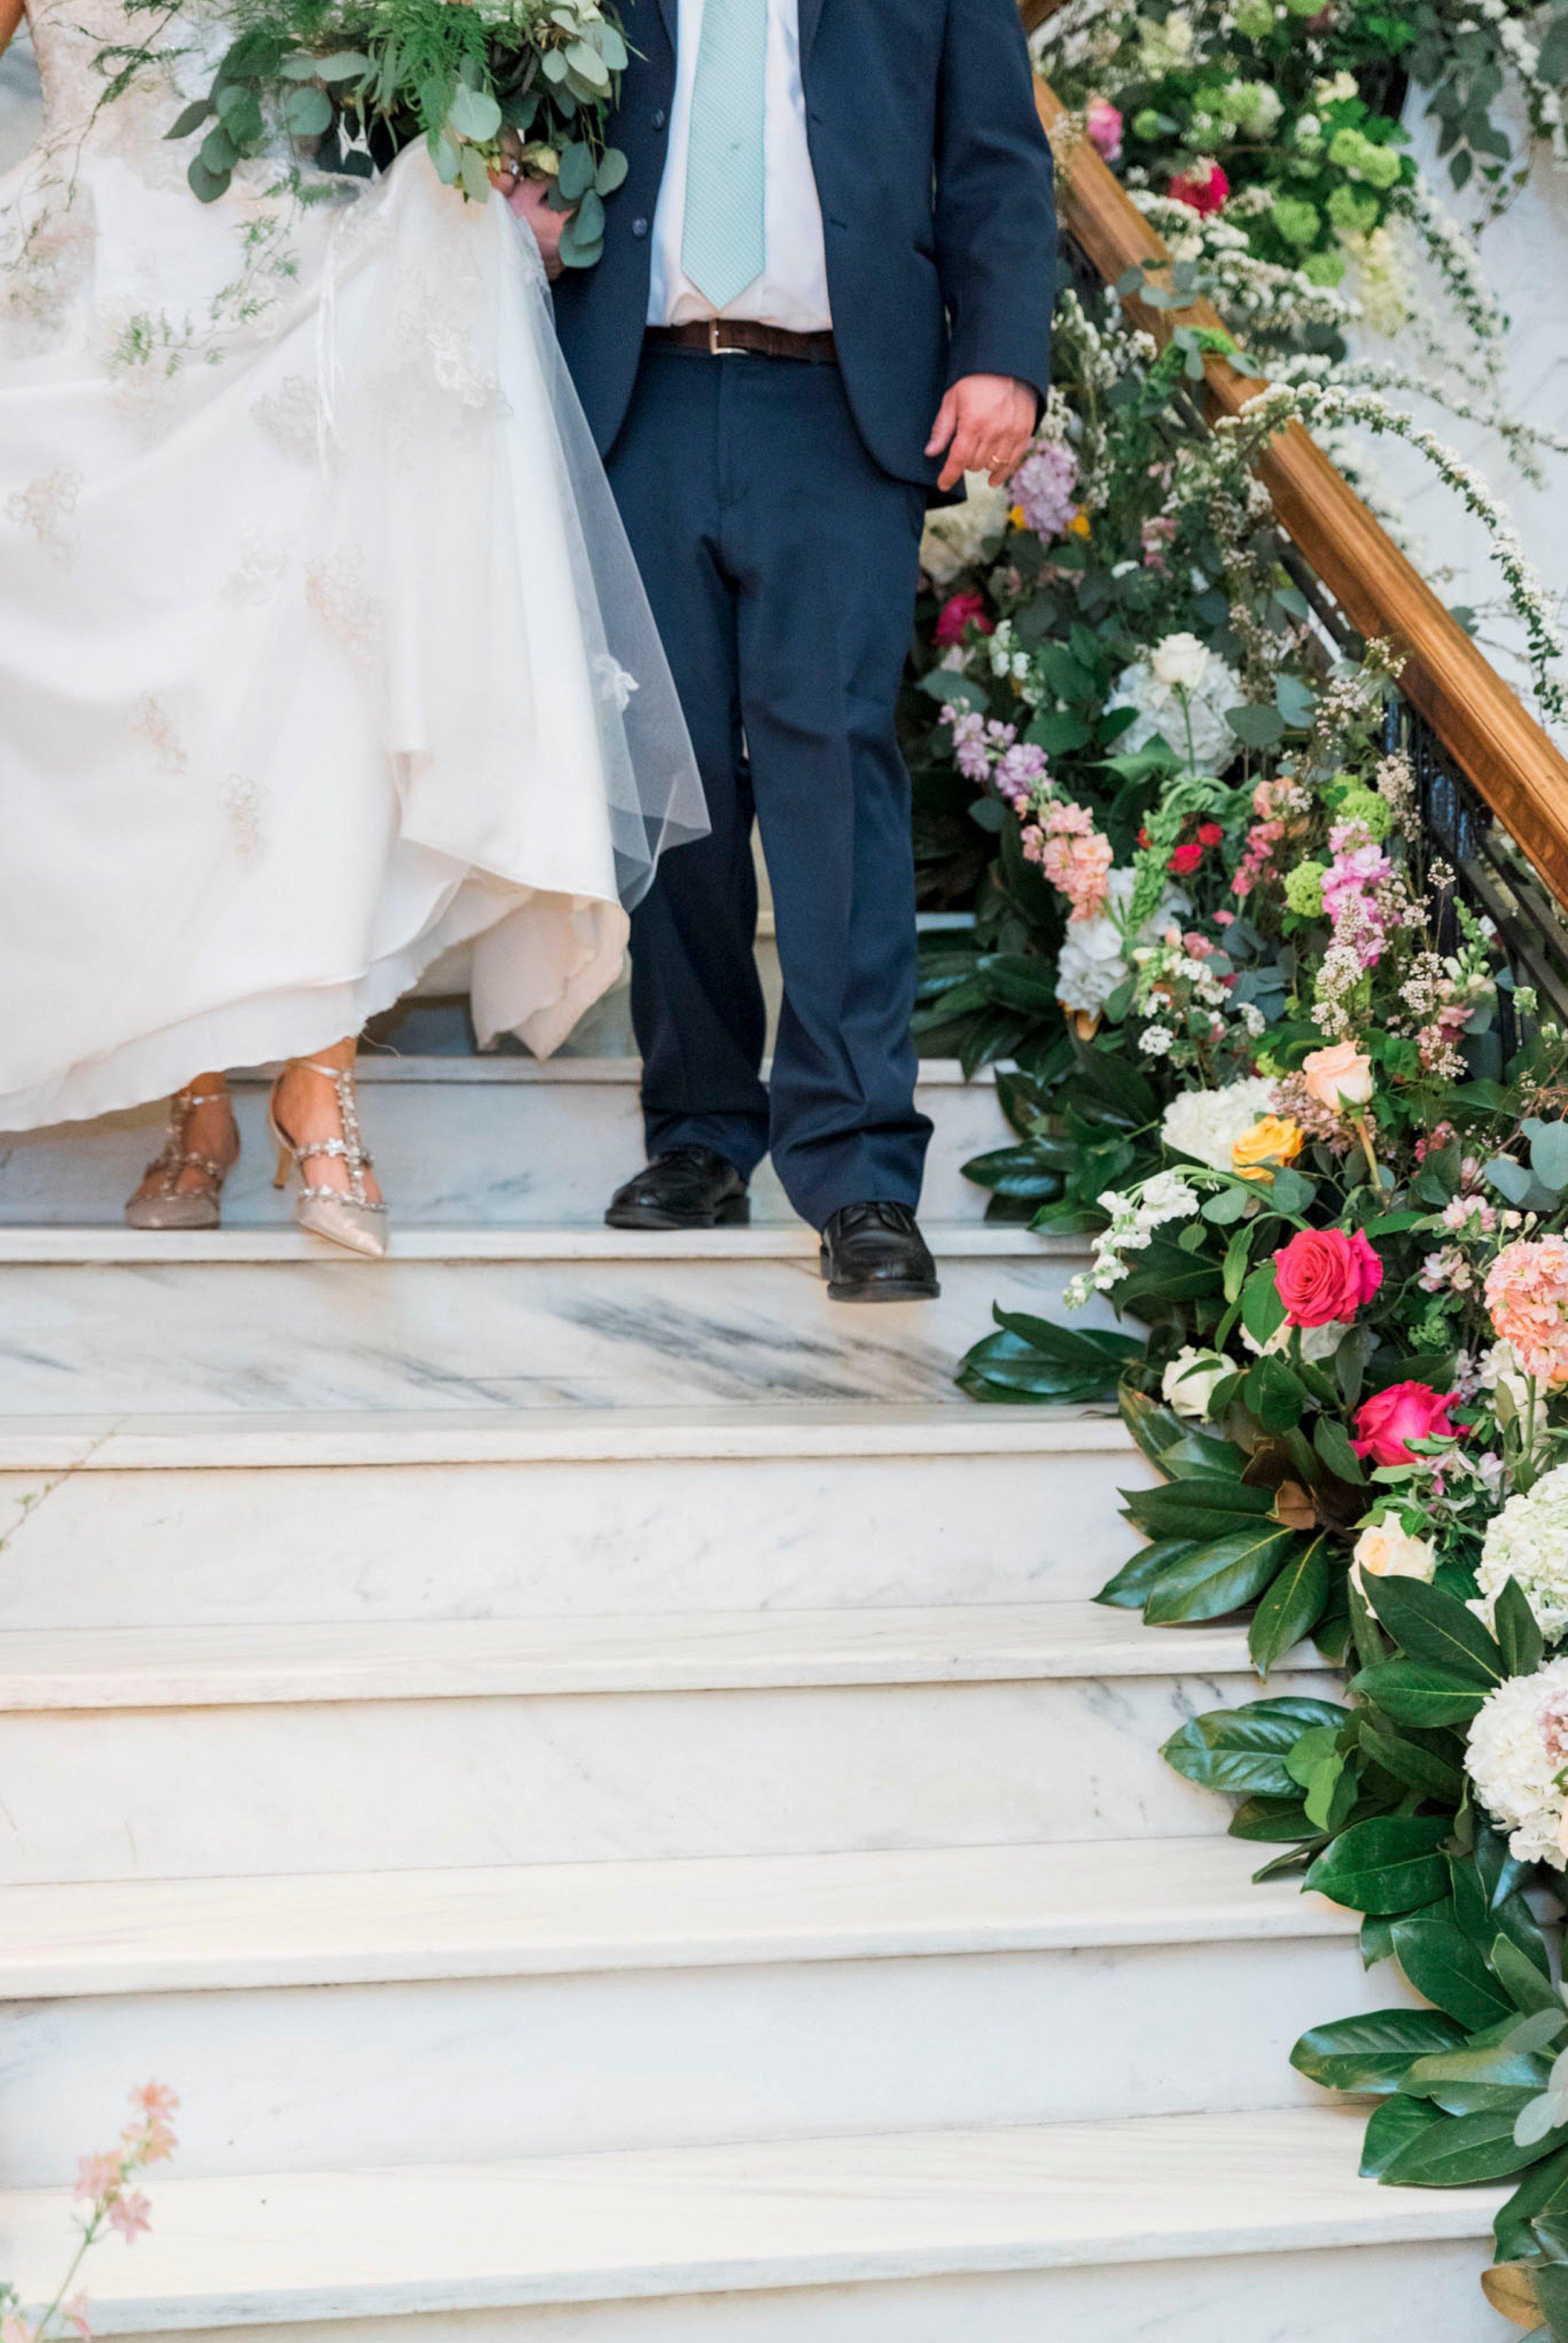 TheVirginianHotel_LynchburgVA_TheVirginianHotelWedding_Virginiaweddingphotographer_Lynchburgvawedding 13.jpg